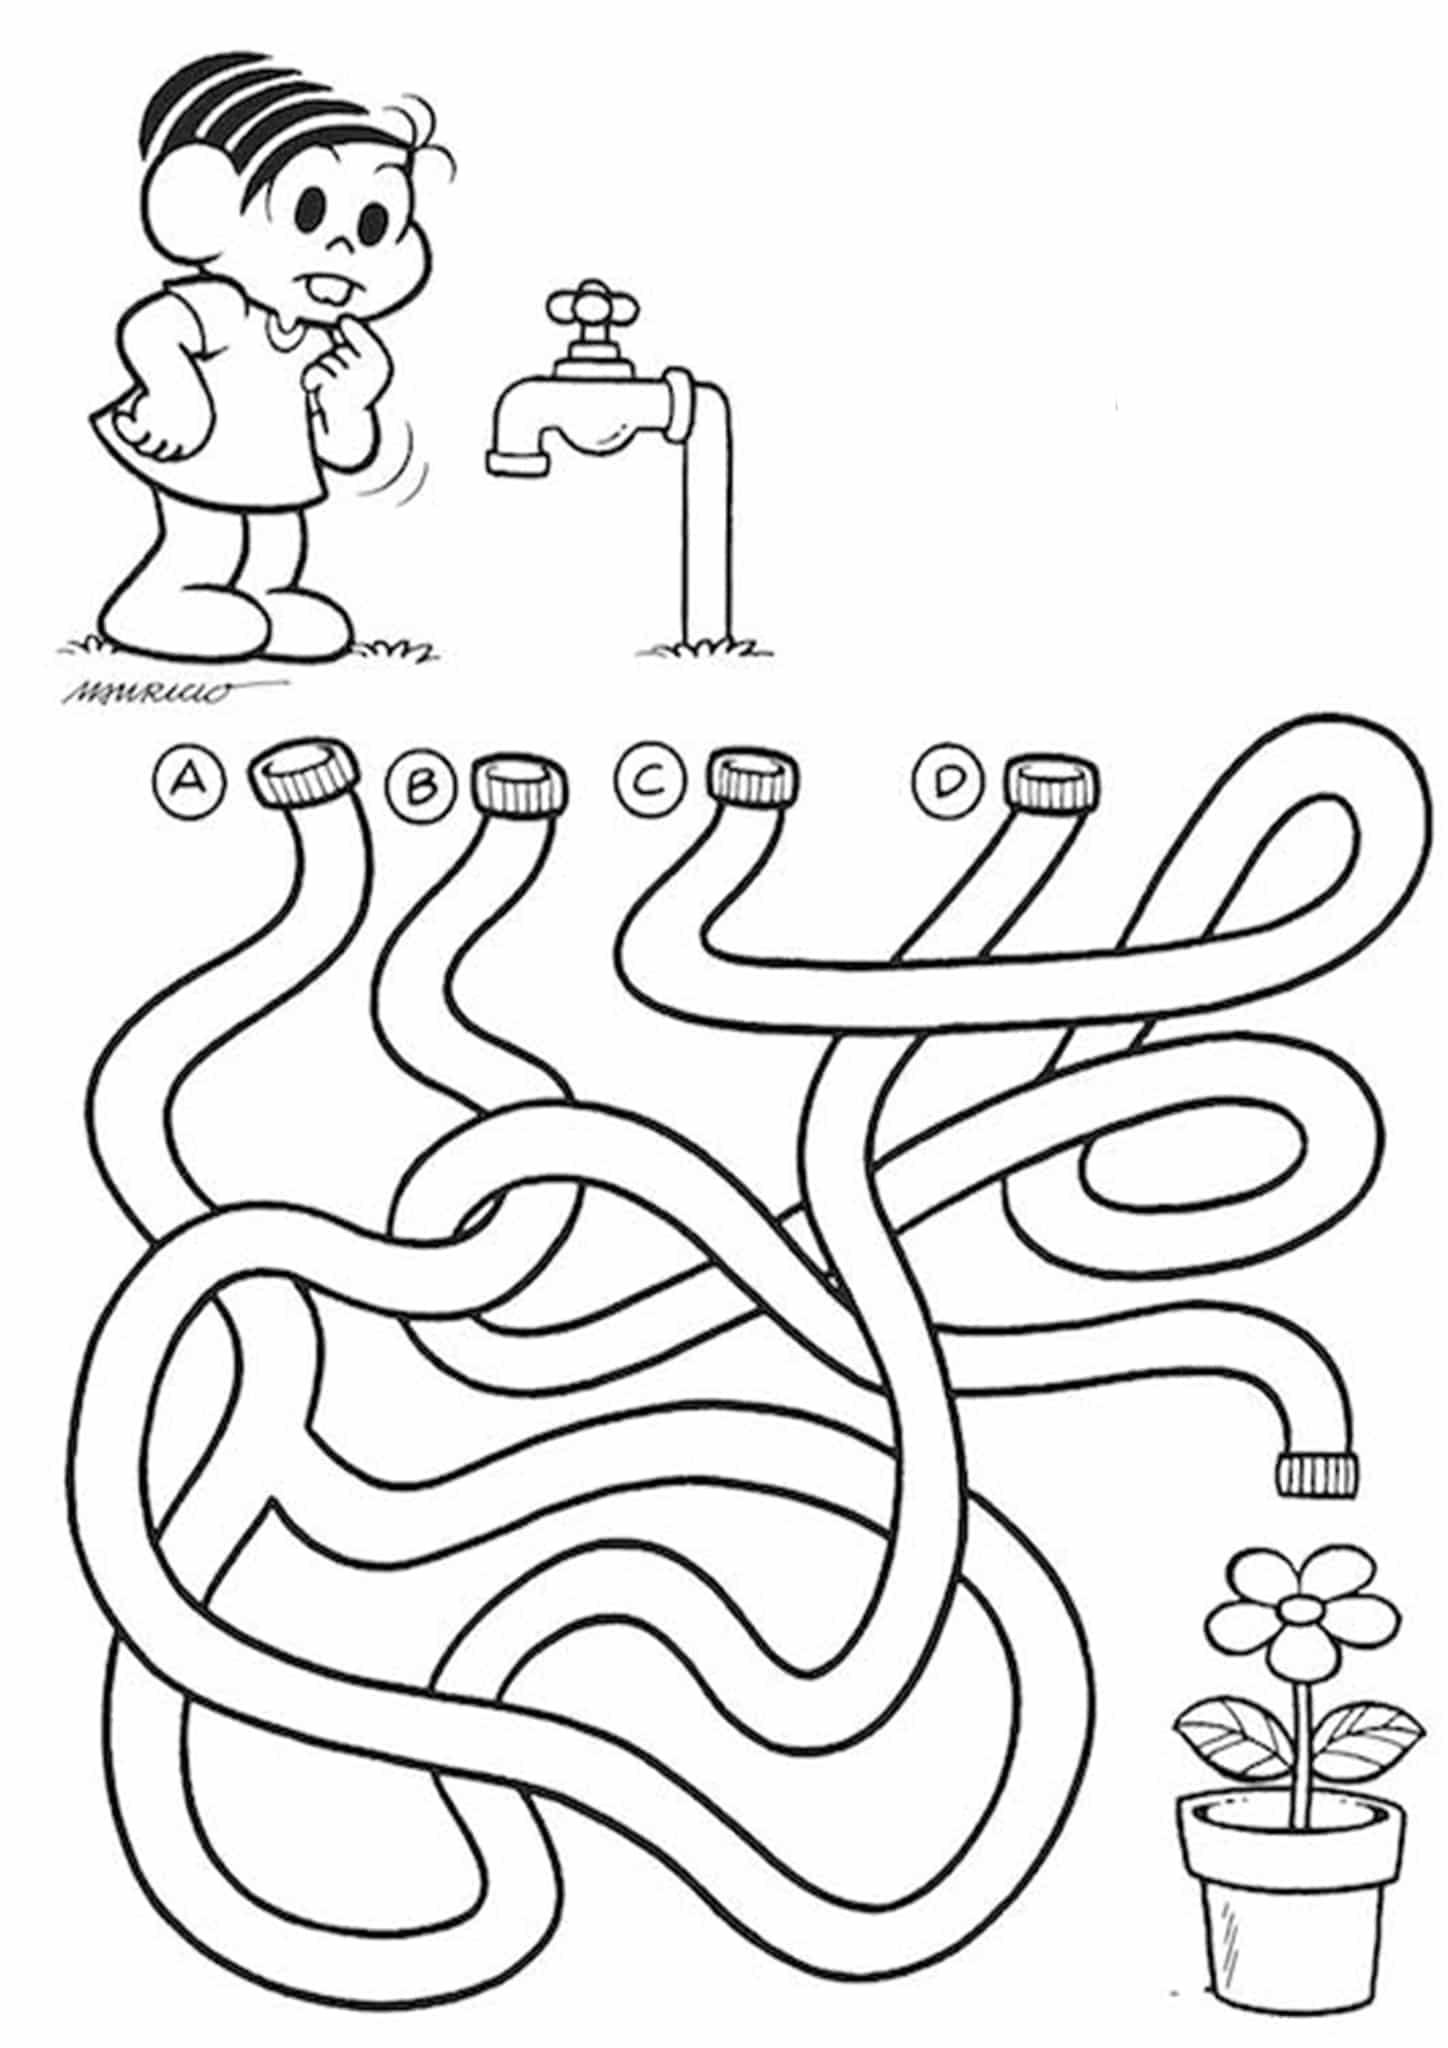 Free Simple Maze Printables For Preschoolers And Kindergartners Tulamama - Get Maze Worksheets For Kindergarten Pictures